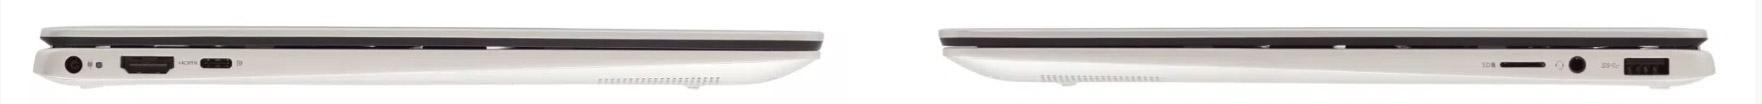 Dell 戴尔Inspiron 灵越13 (7386)评测